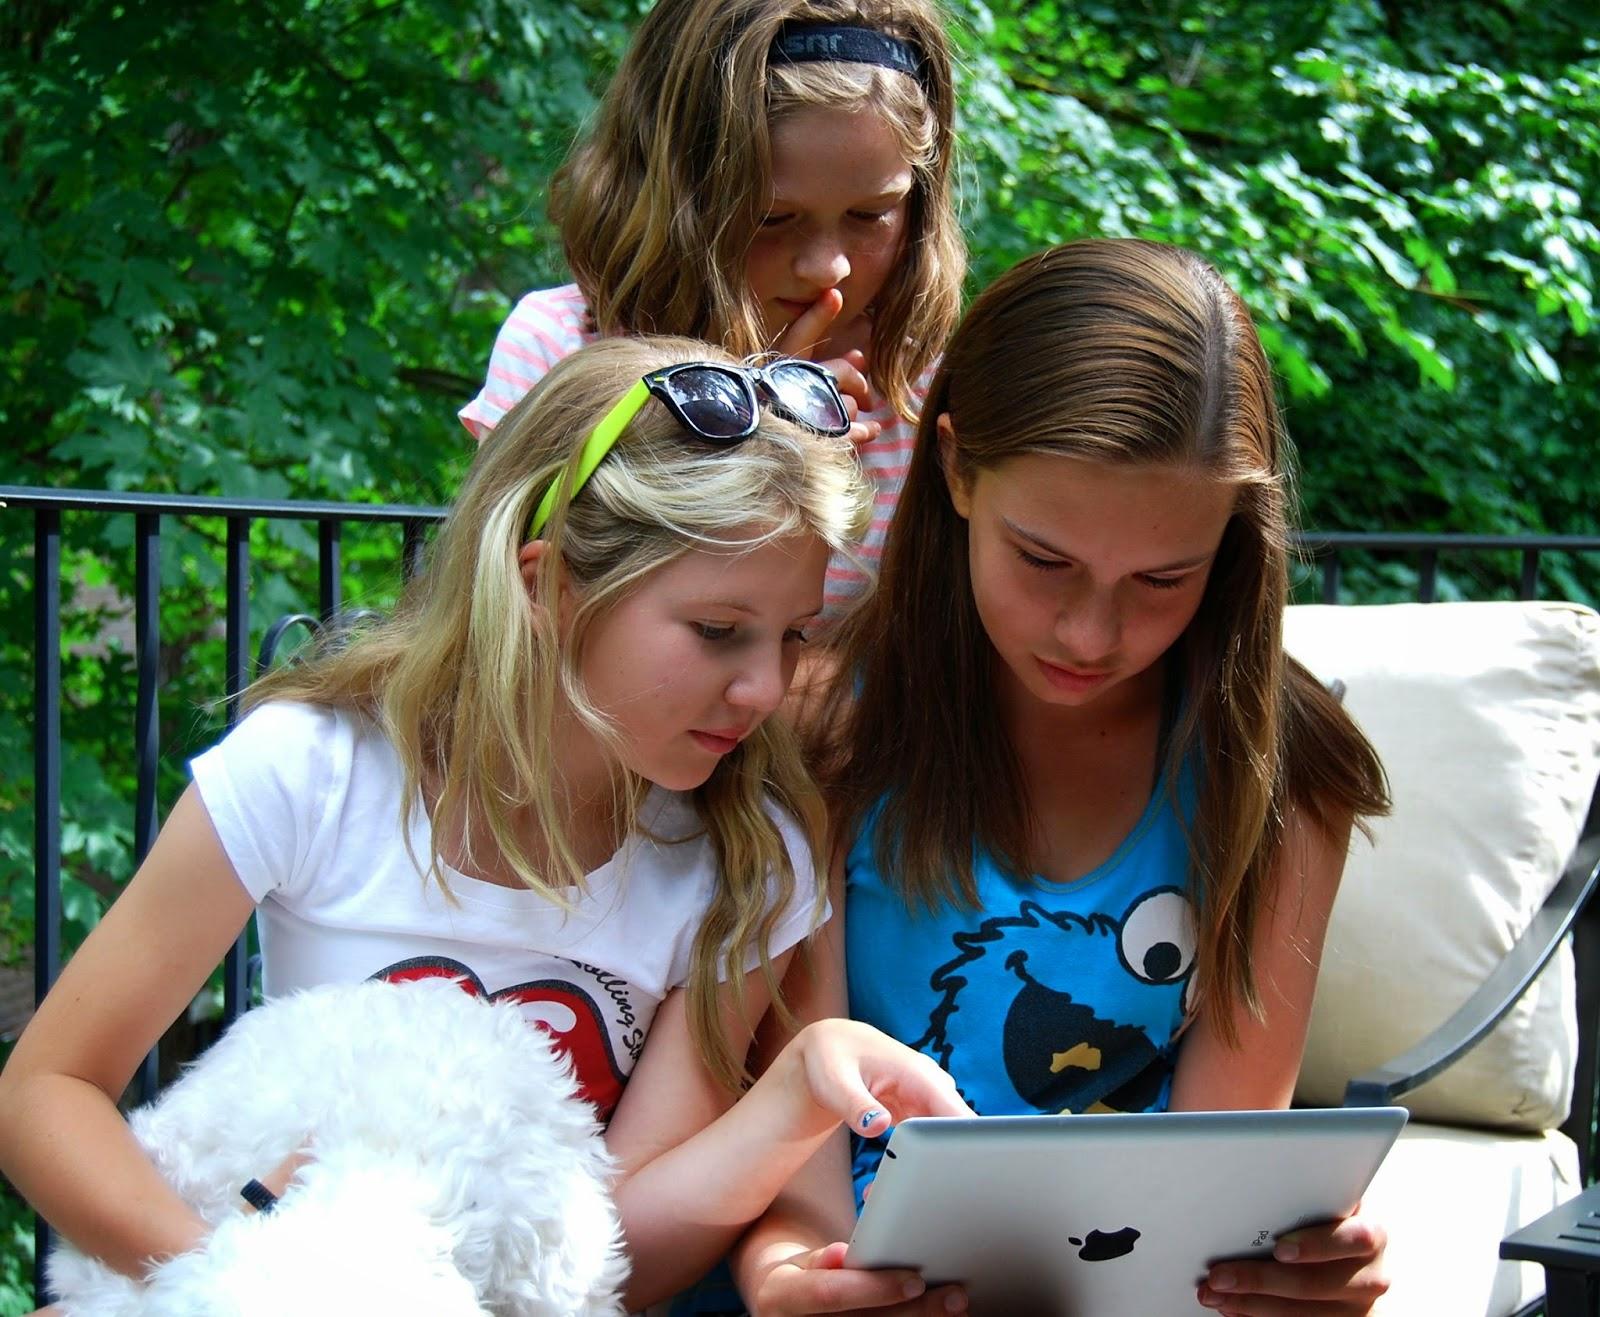 meet teenage girls online